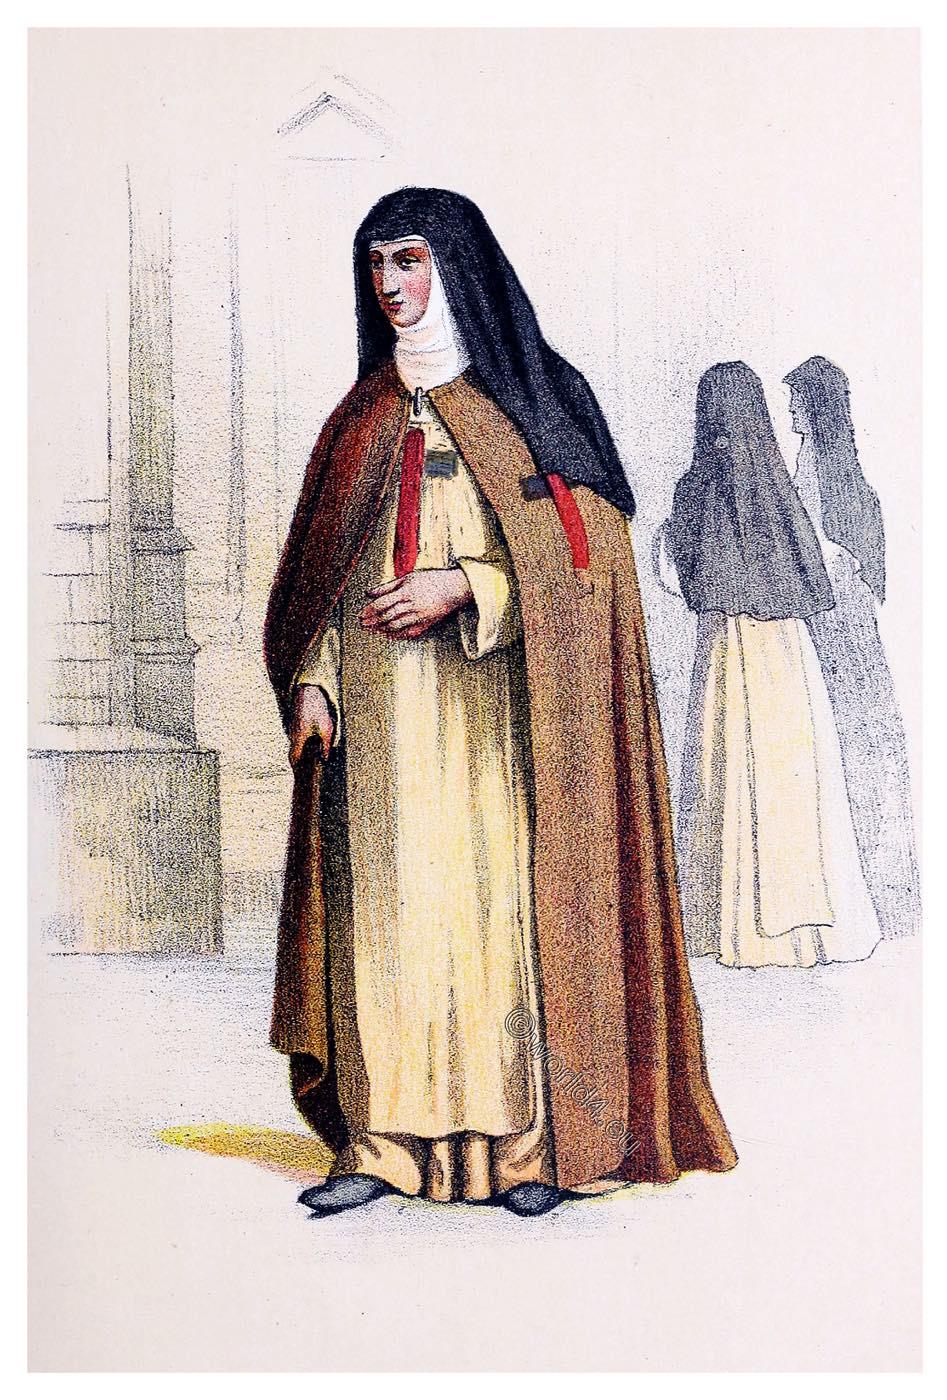 Trinitarian, nun, habit, Trinitarians, Religious, orders,